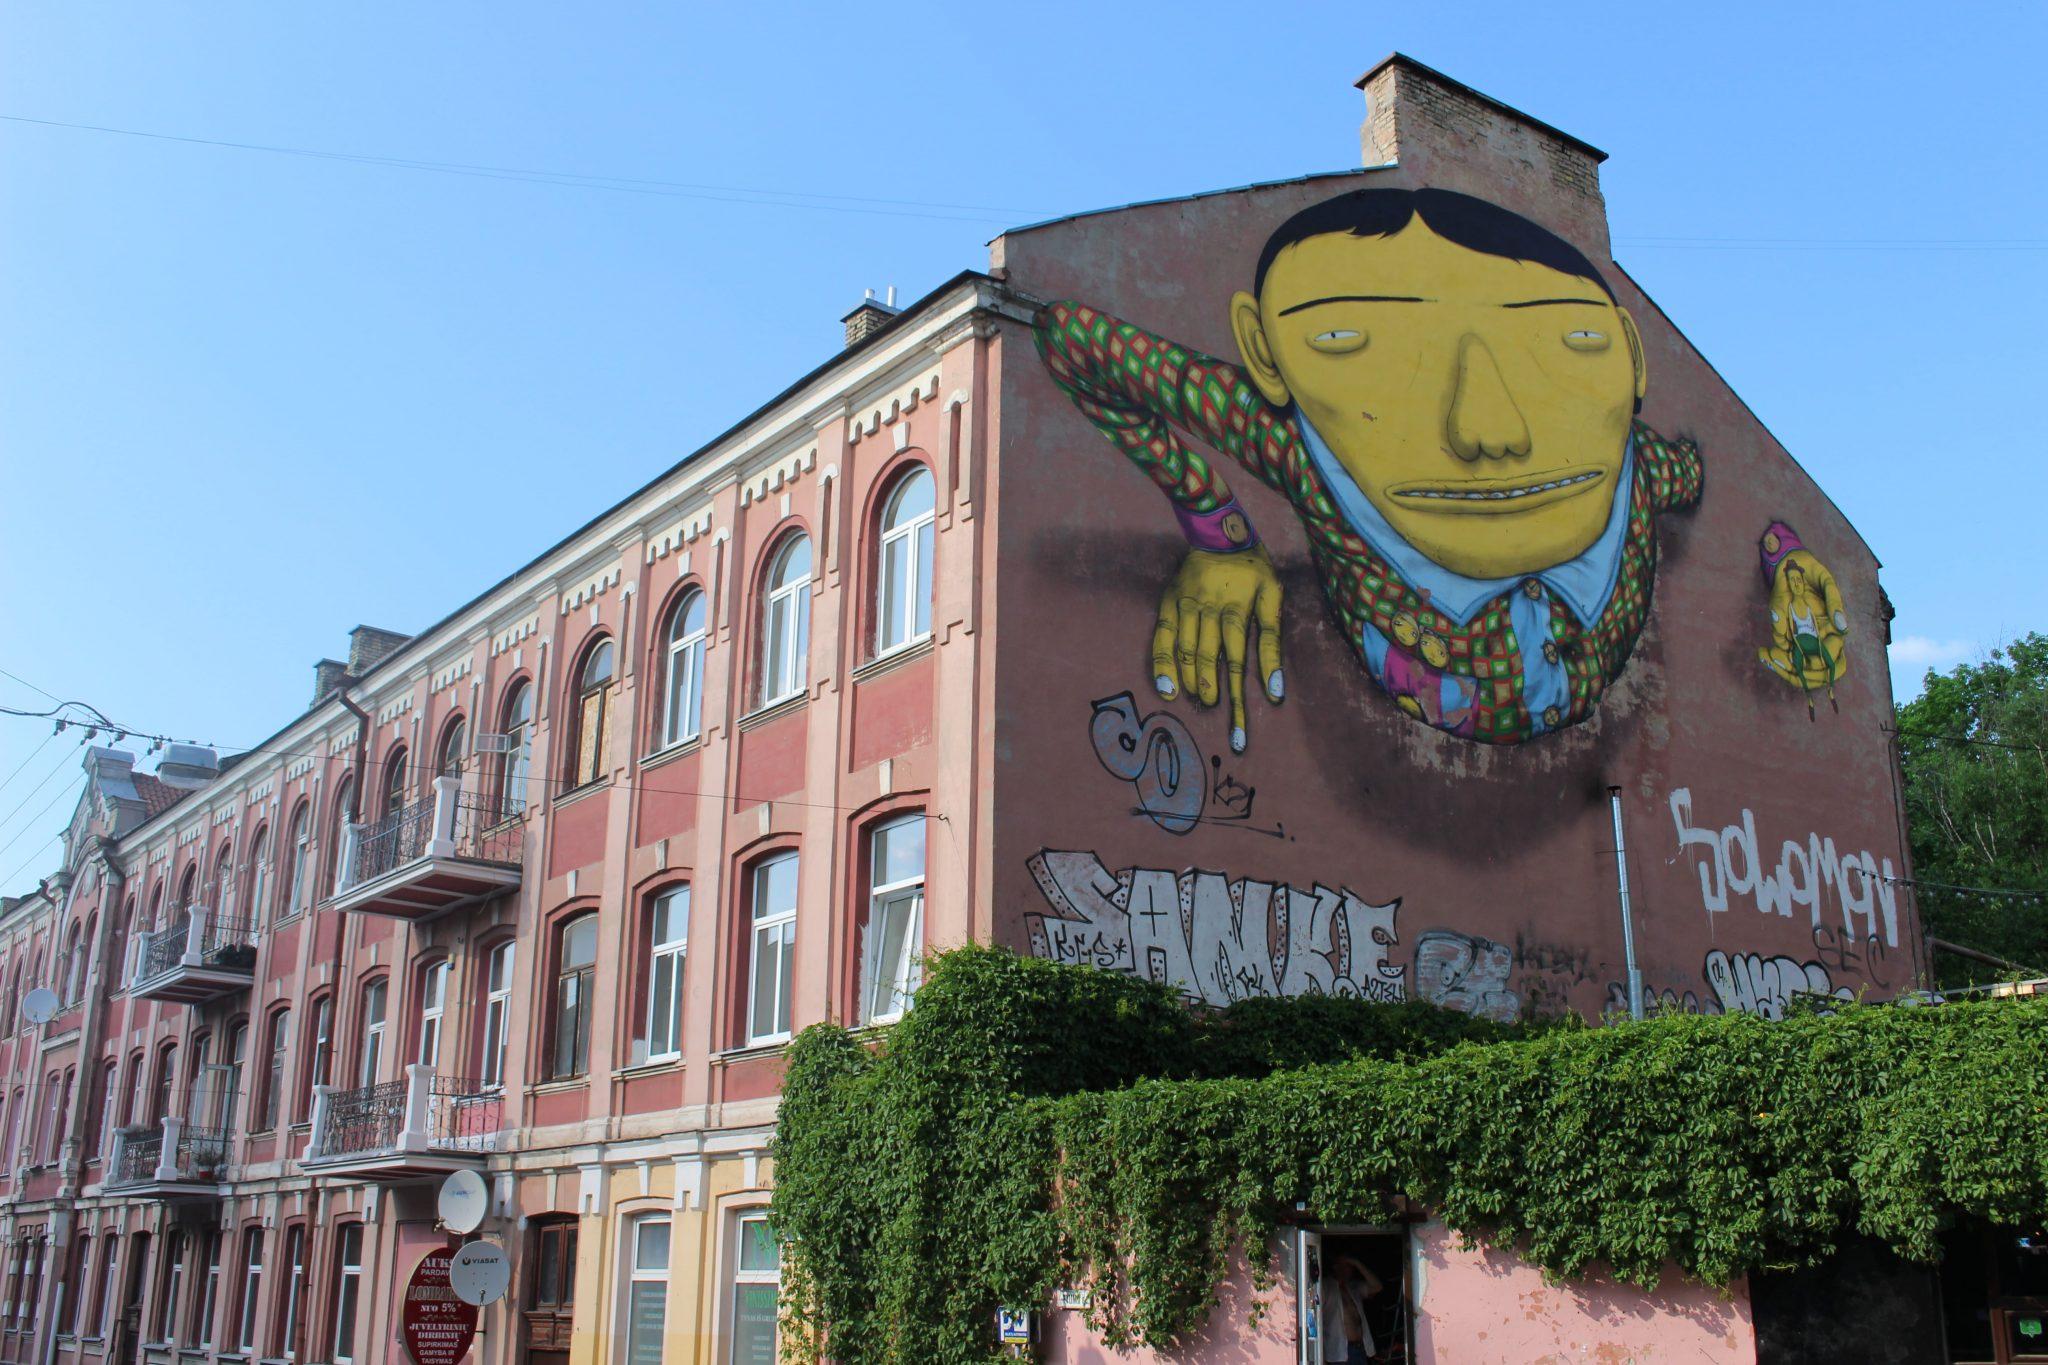 Os Gemeos Vilnnius street art